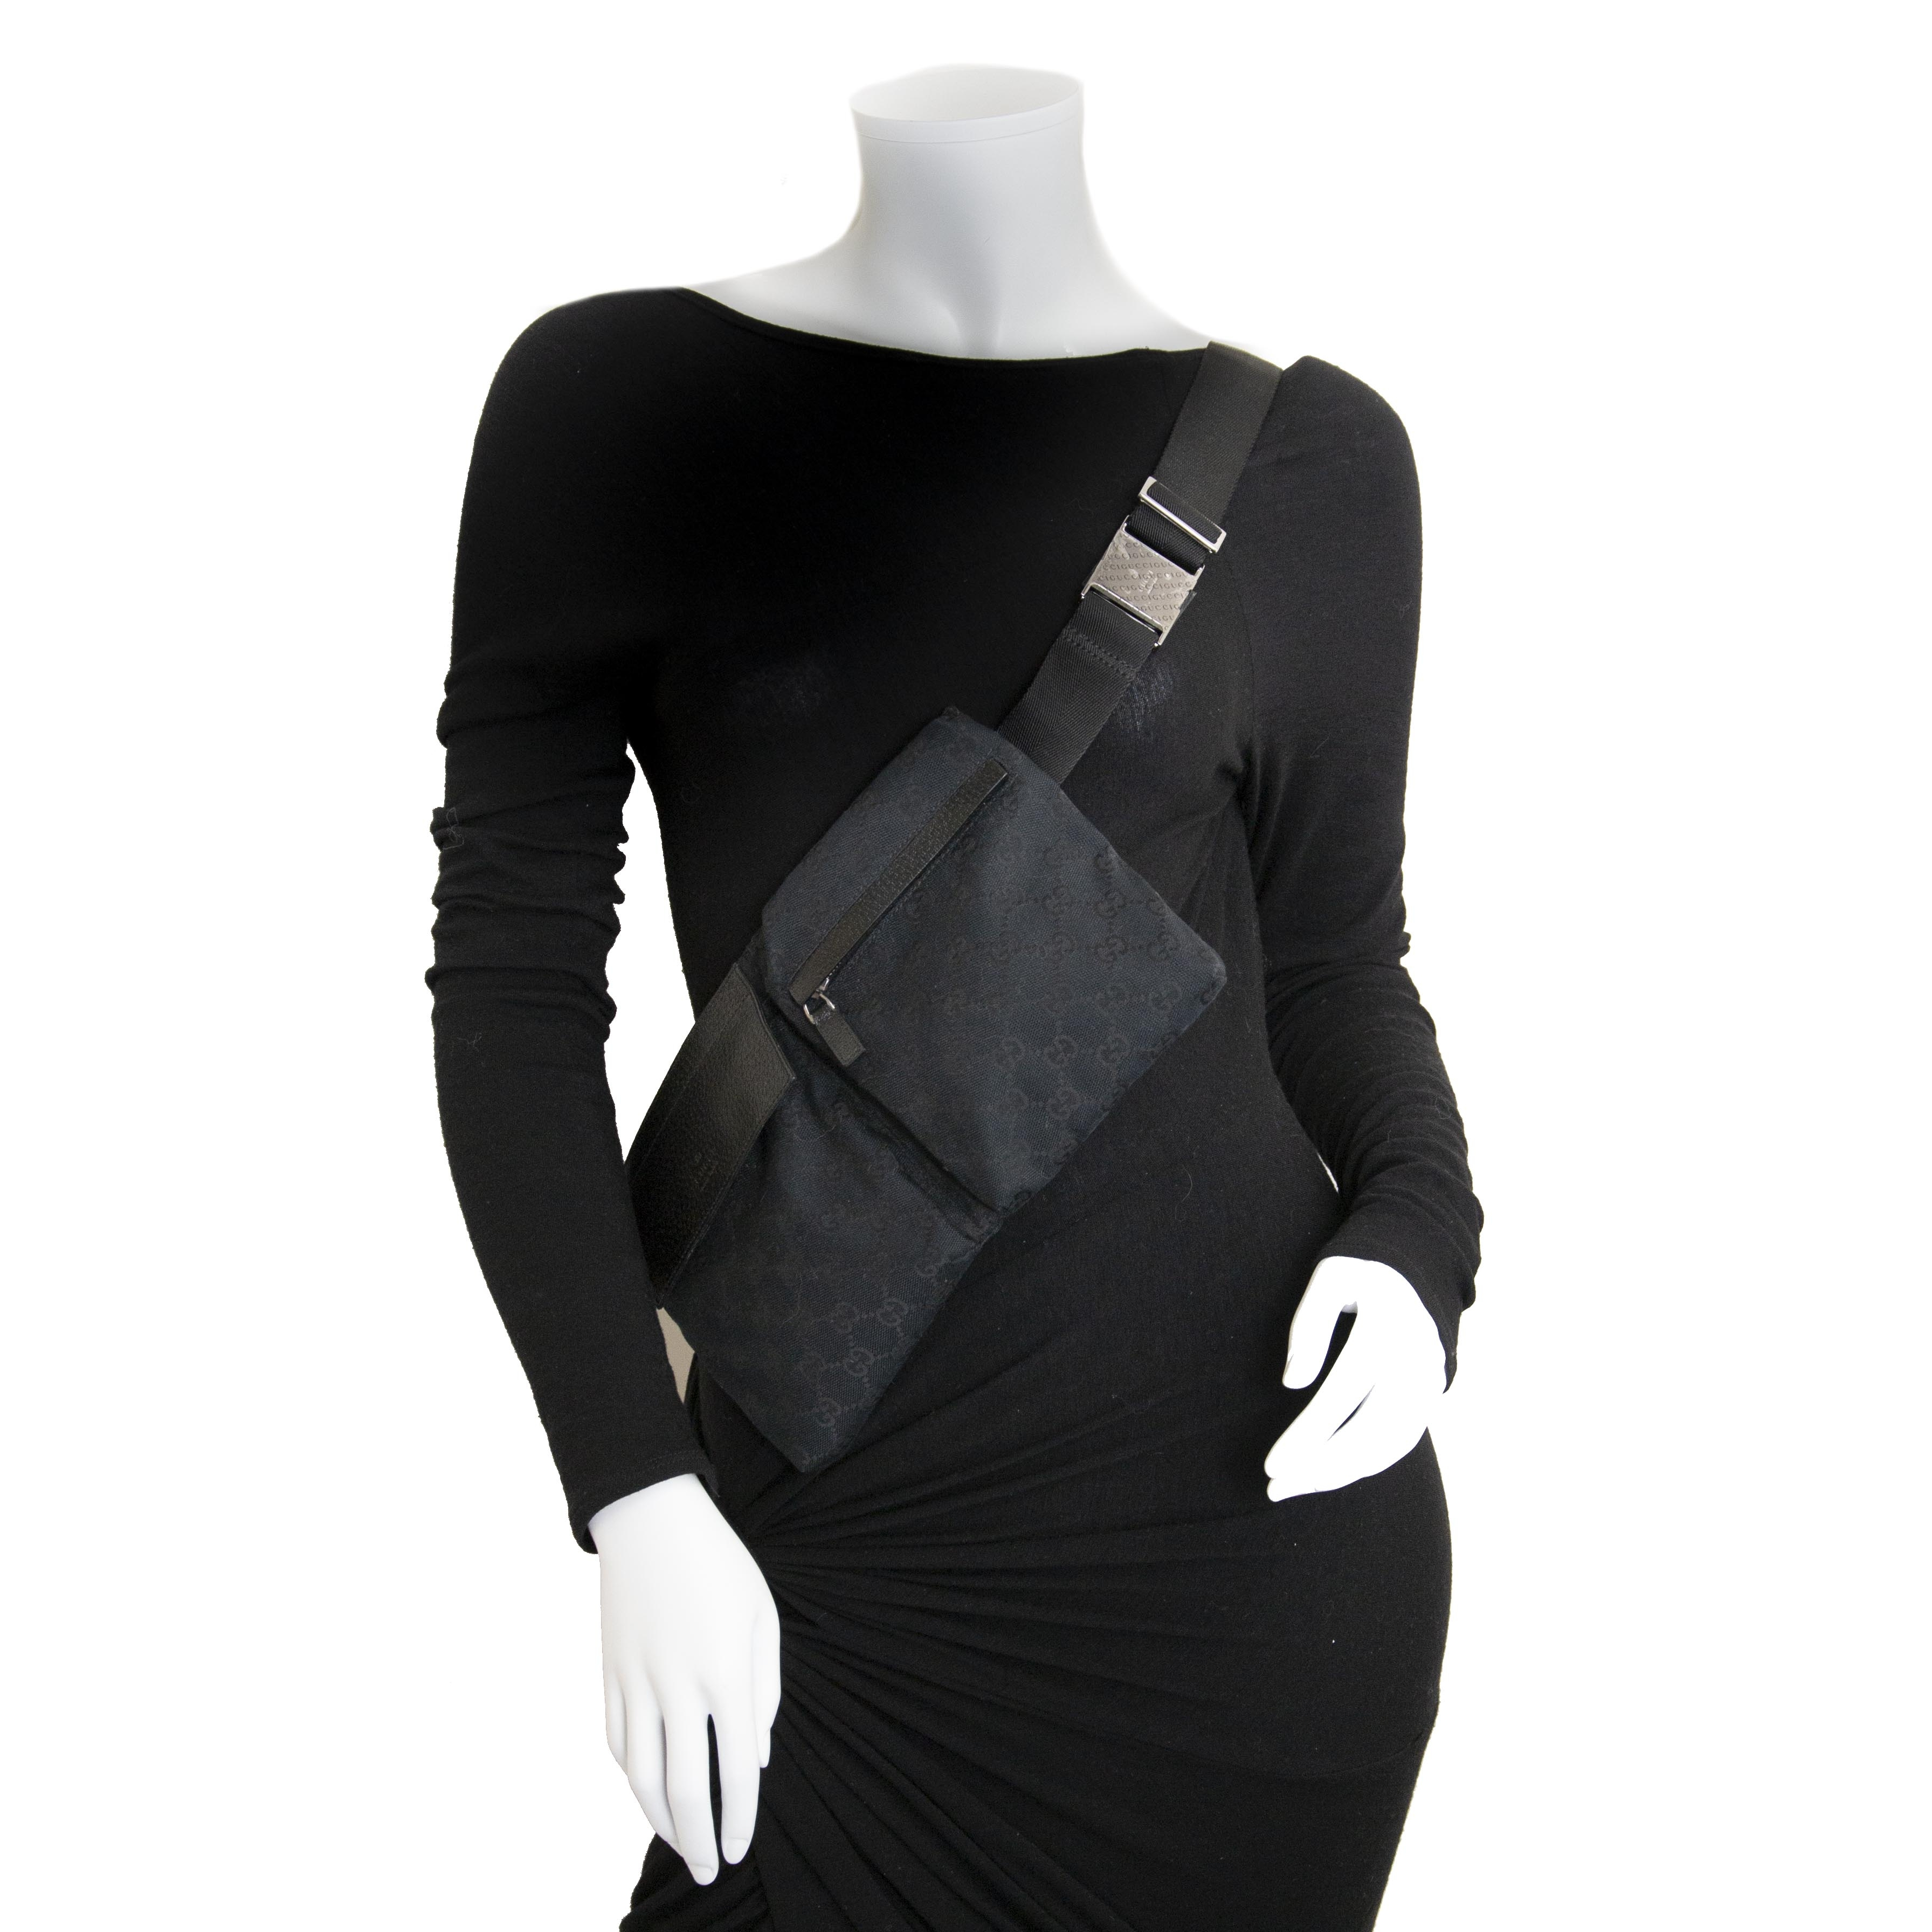 0c4c113b35f8 ... Gucci Black Monogram Belt Bag now for sale at labellov vintage fashion  webshop belgium